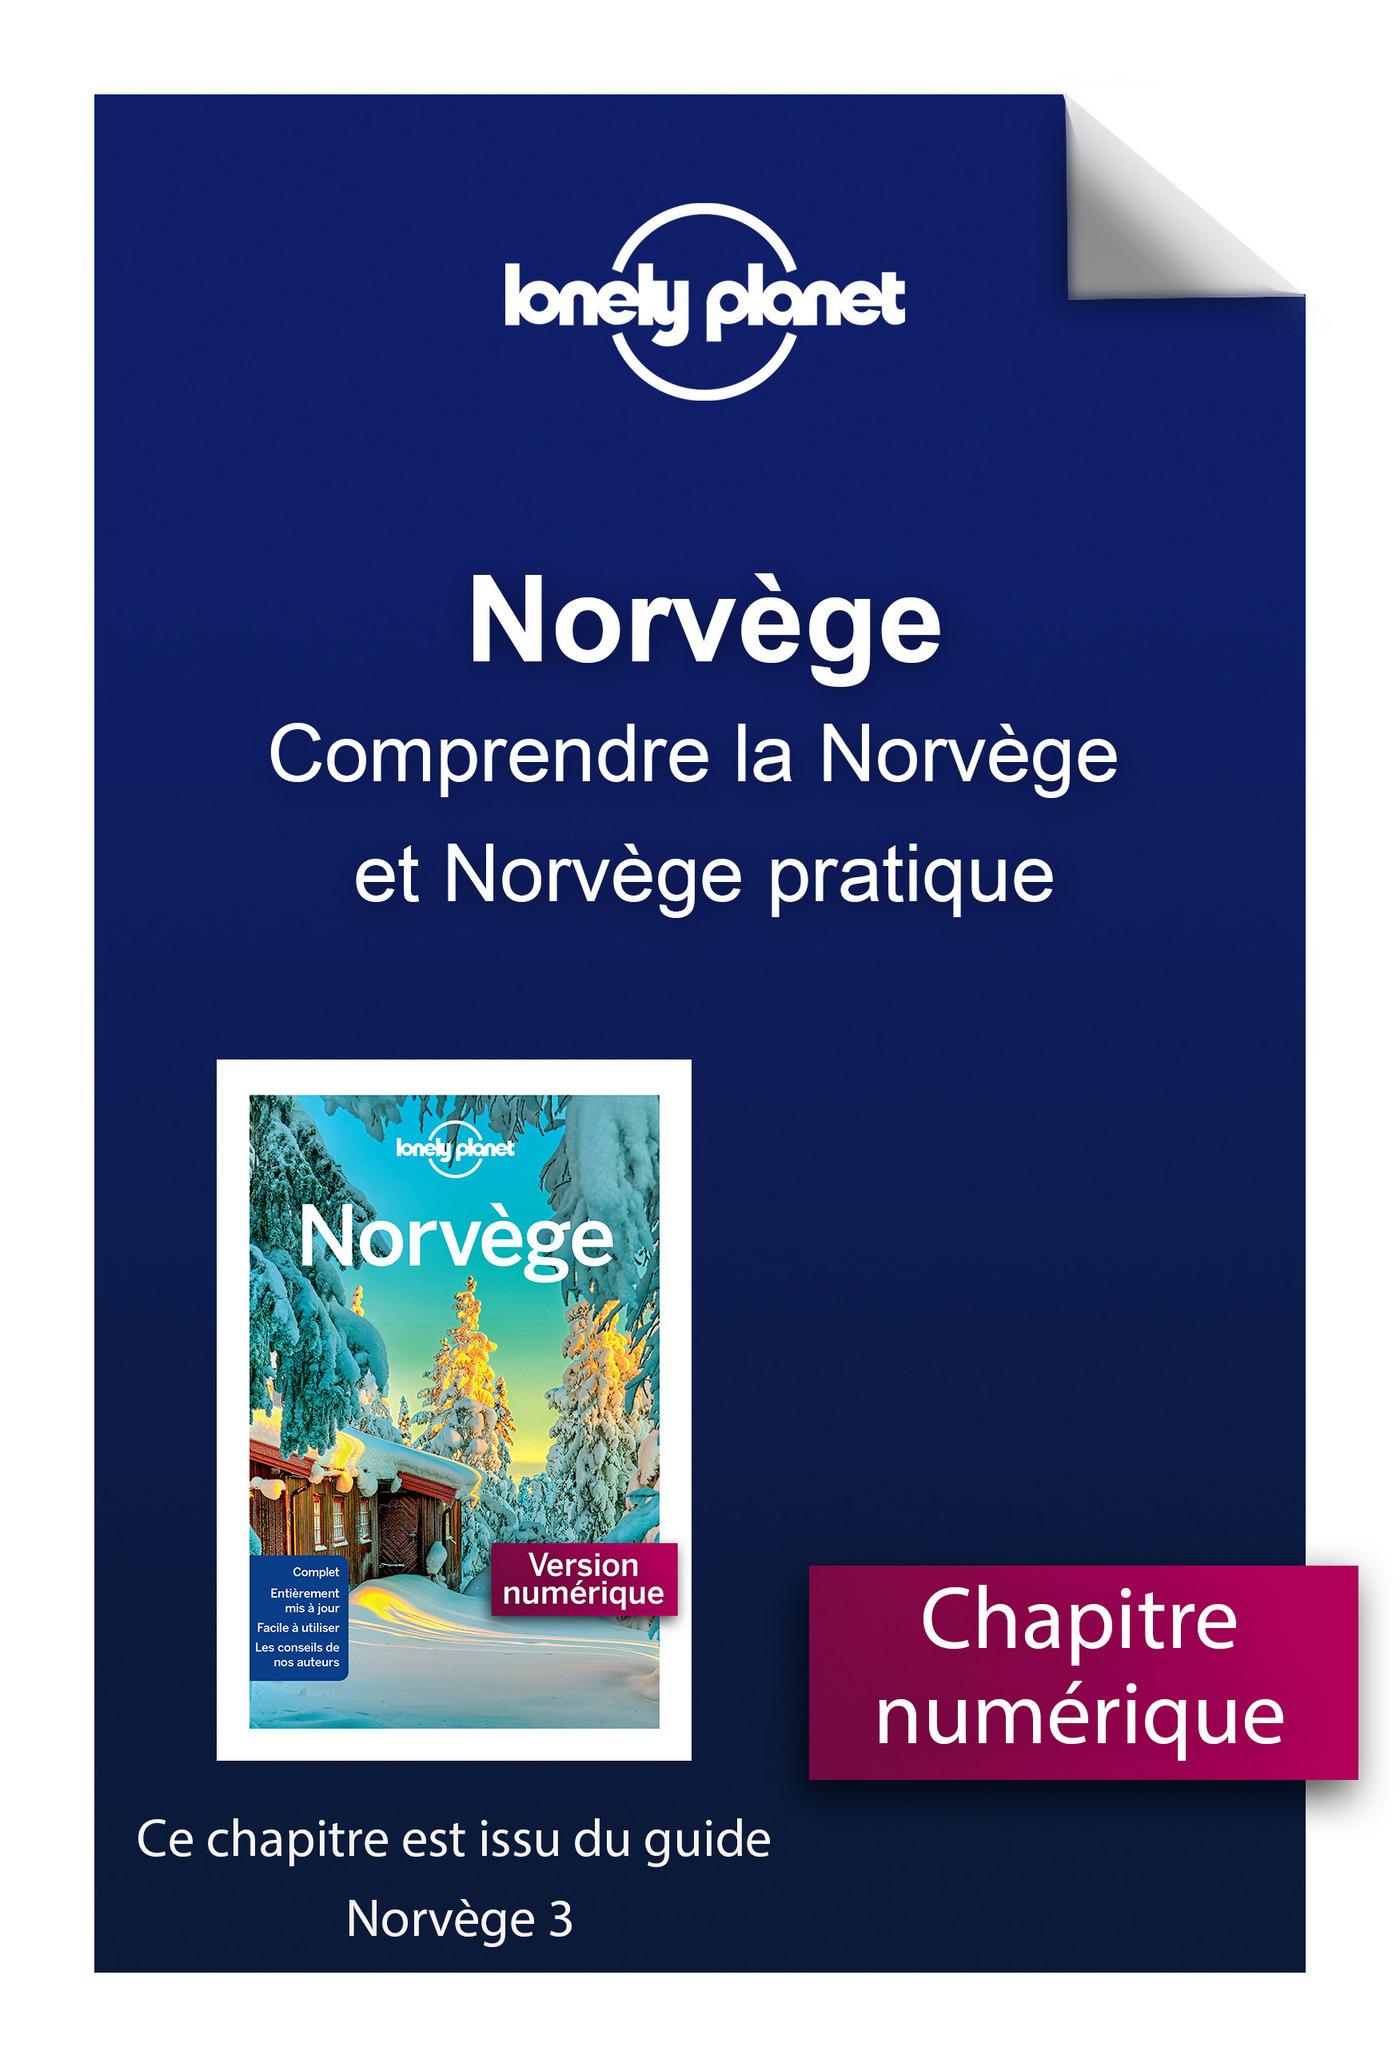 Norvège 3 - Comprendre la Norvège et Norvège pratique